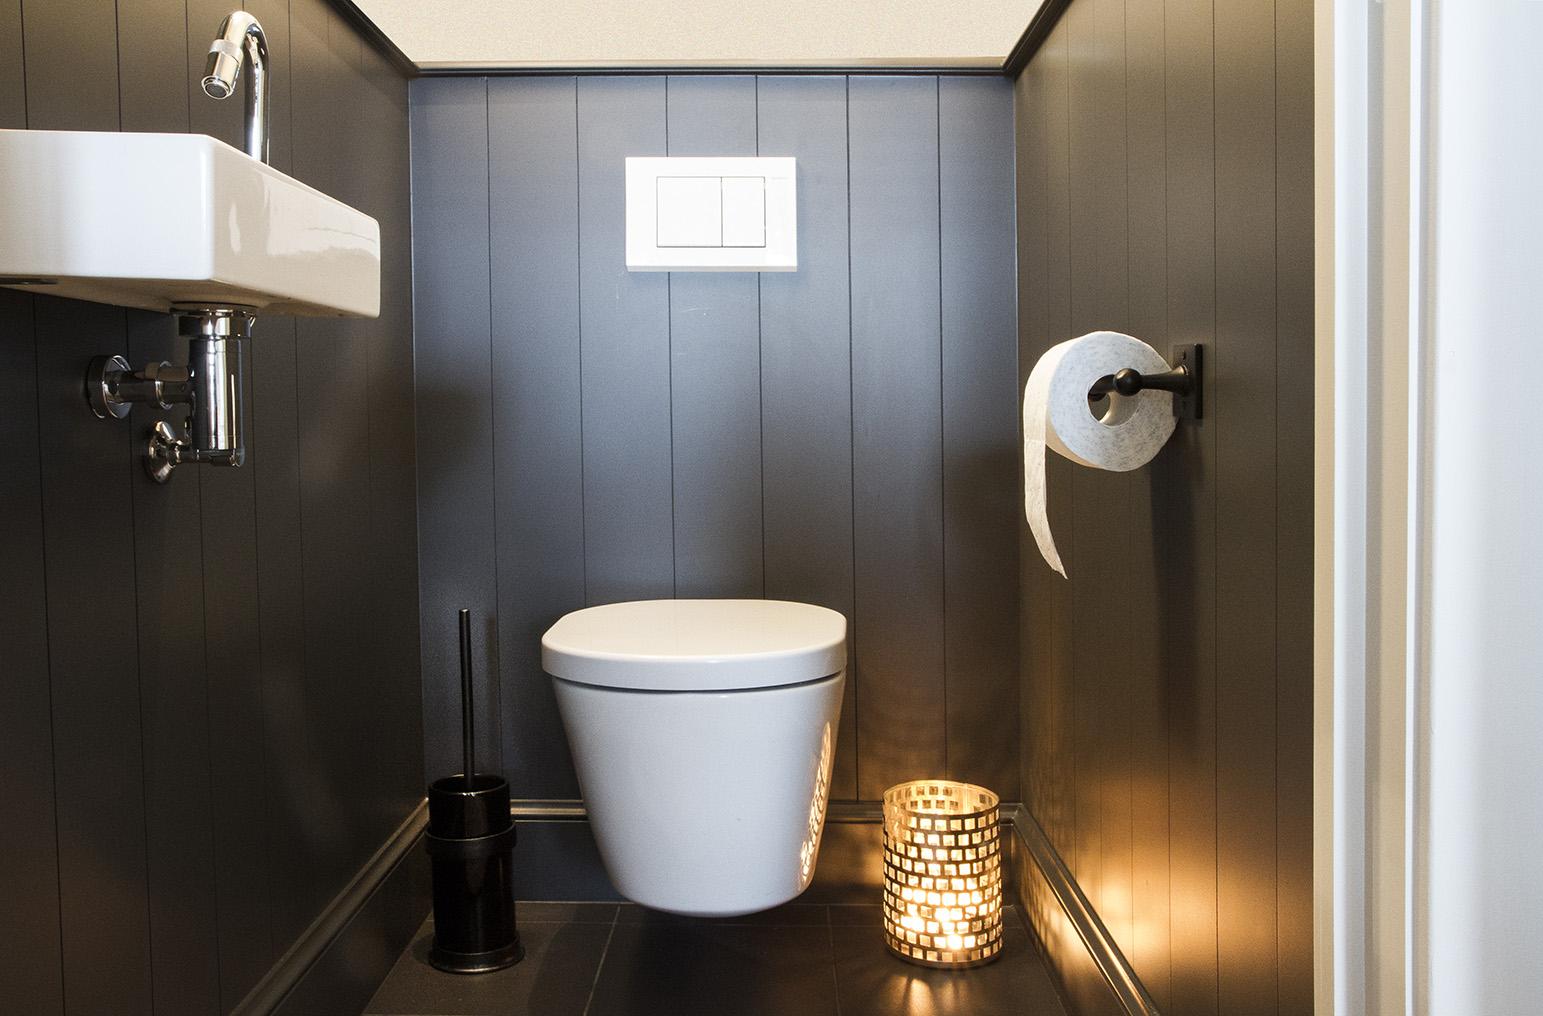 Retro toilet accessoires het kán! dauby